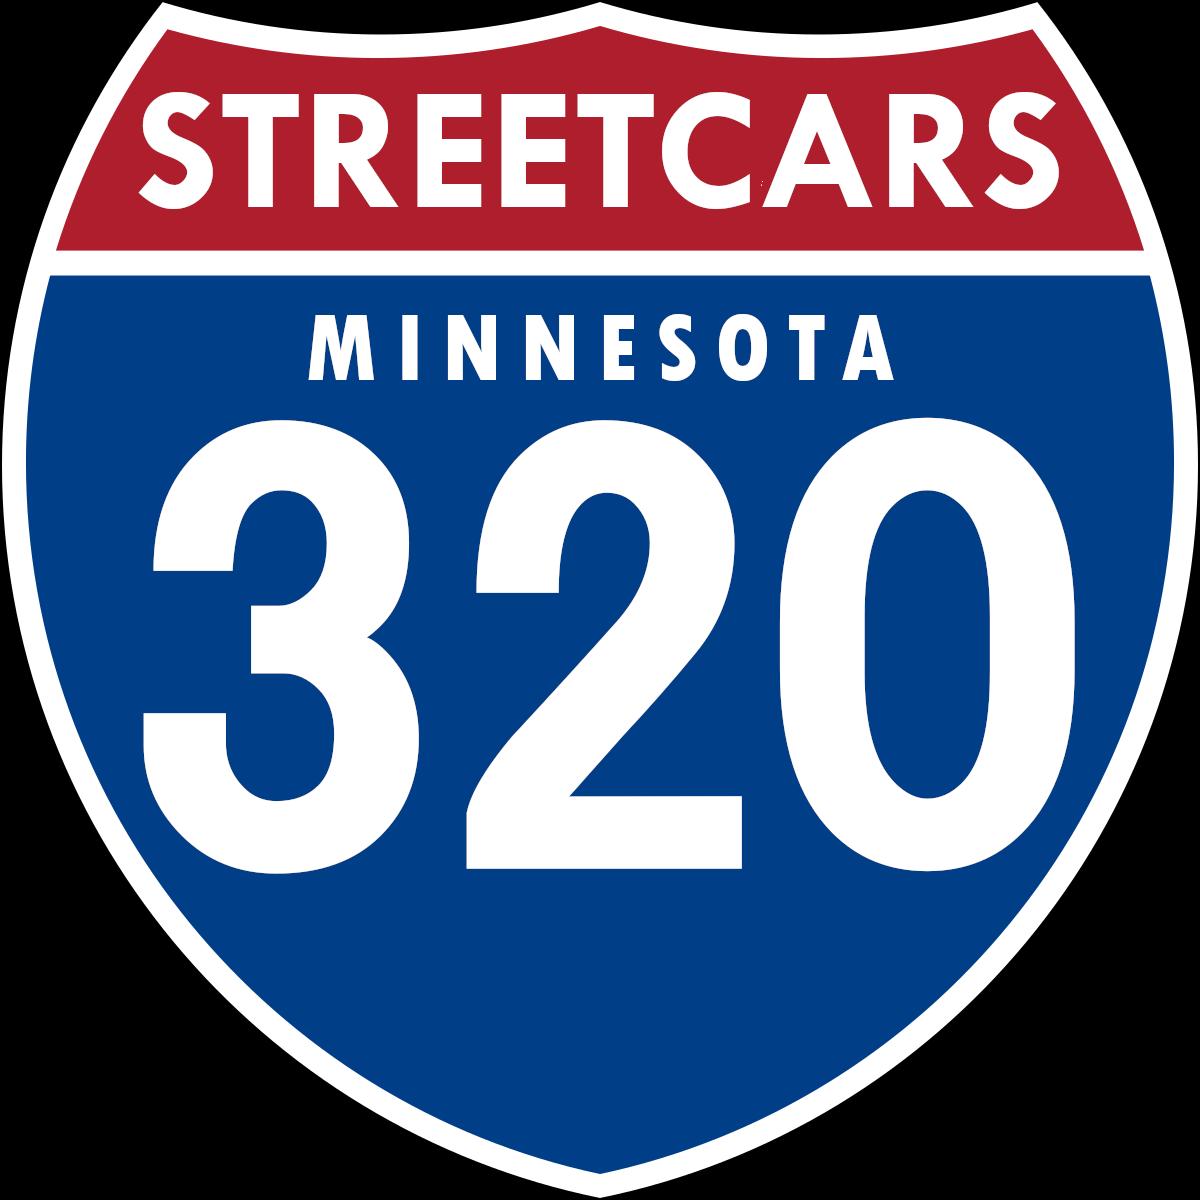 320 Street Cars